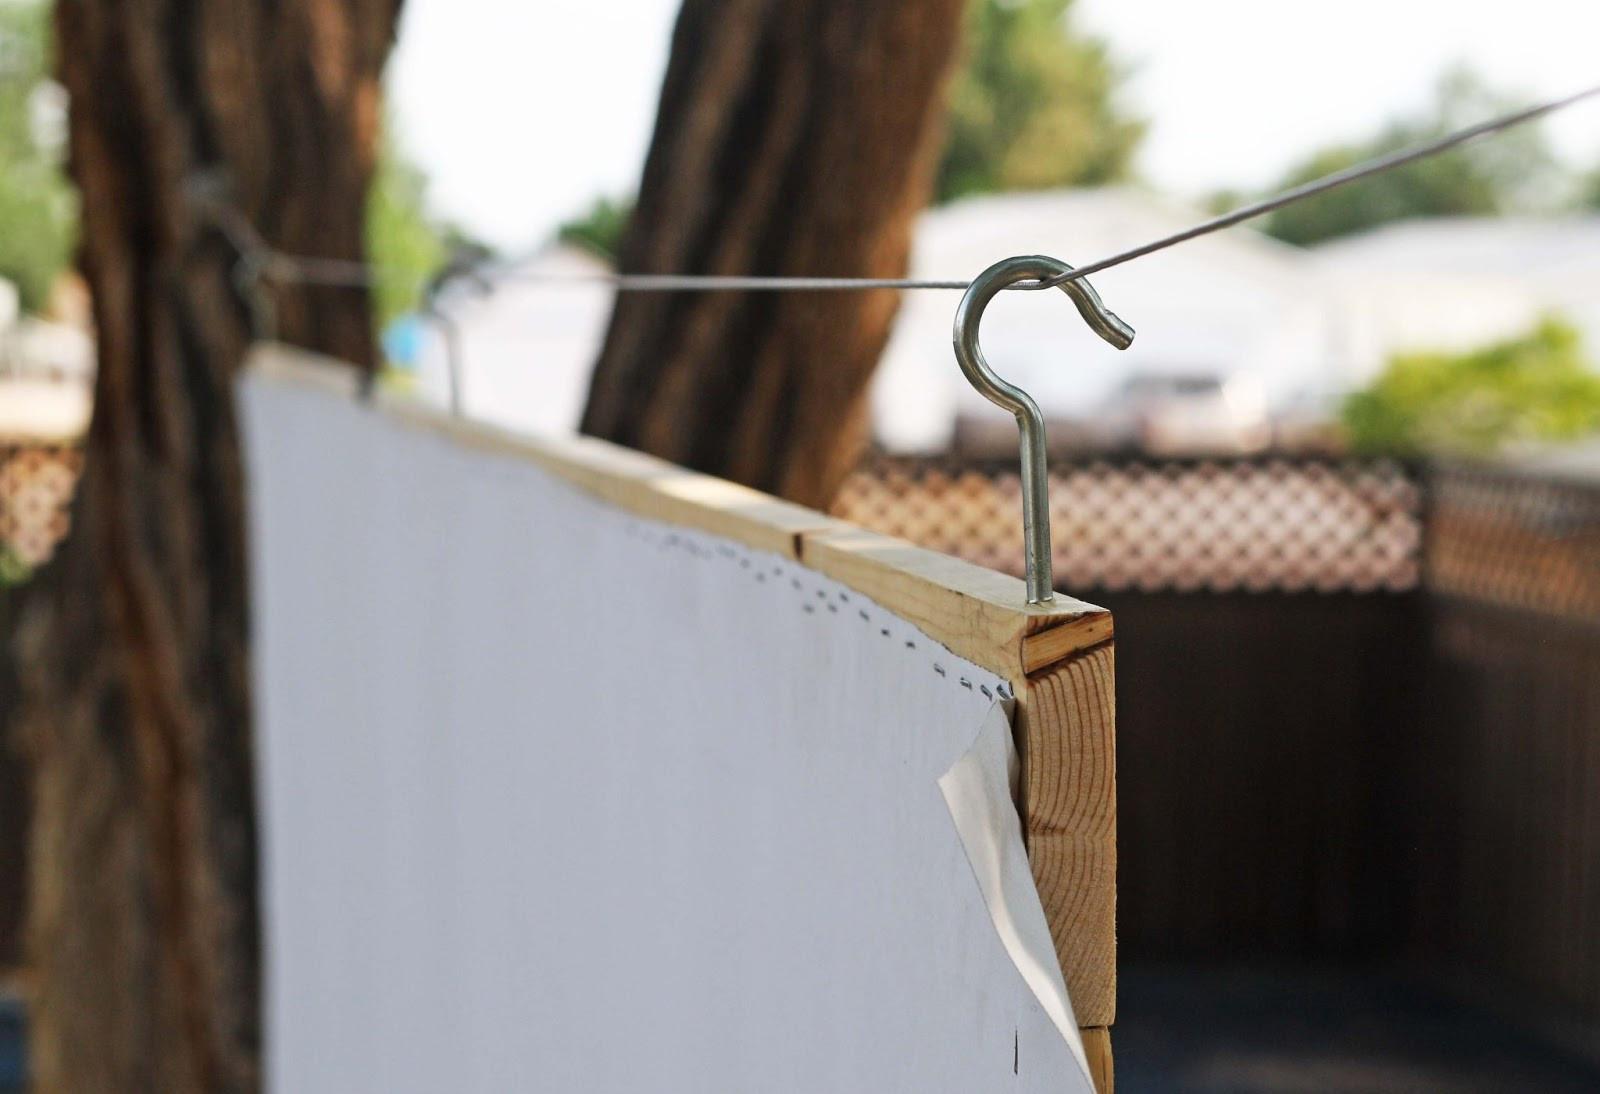 DIY Outdoor Movie Screen Material  DIY Outdoor Movie Screen Running With Scissors